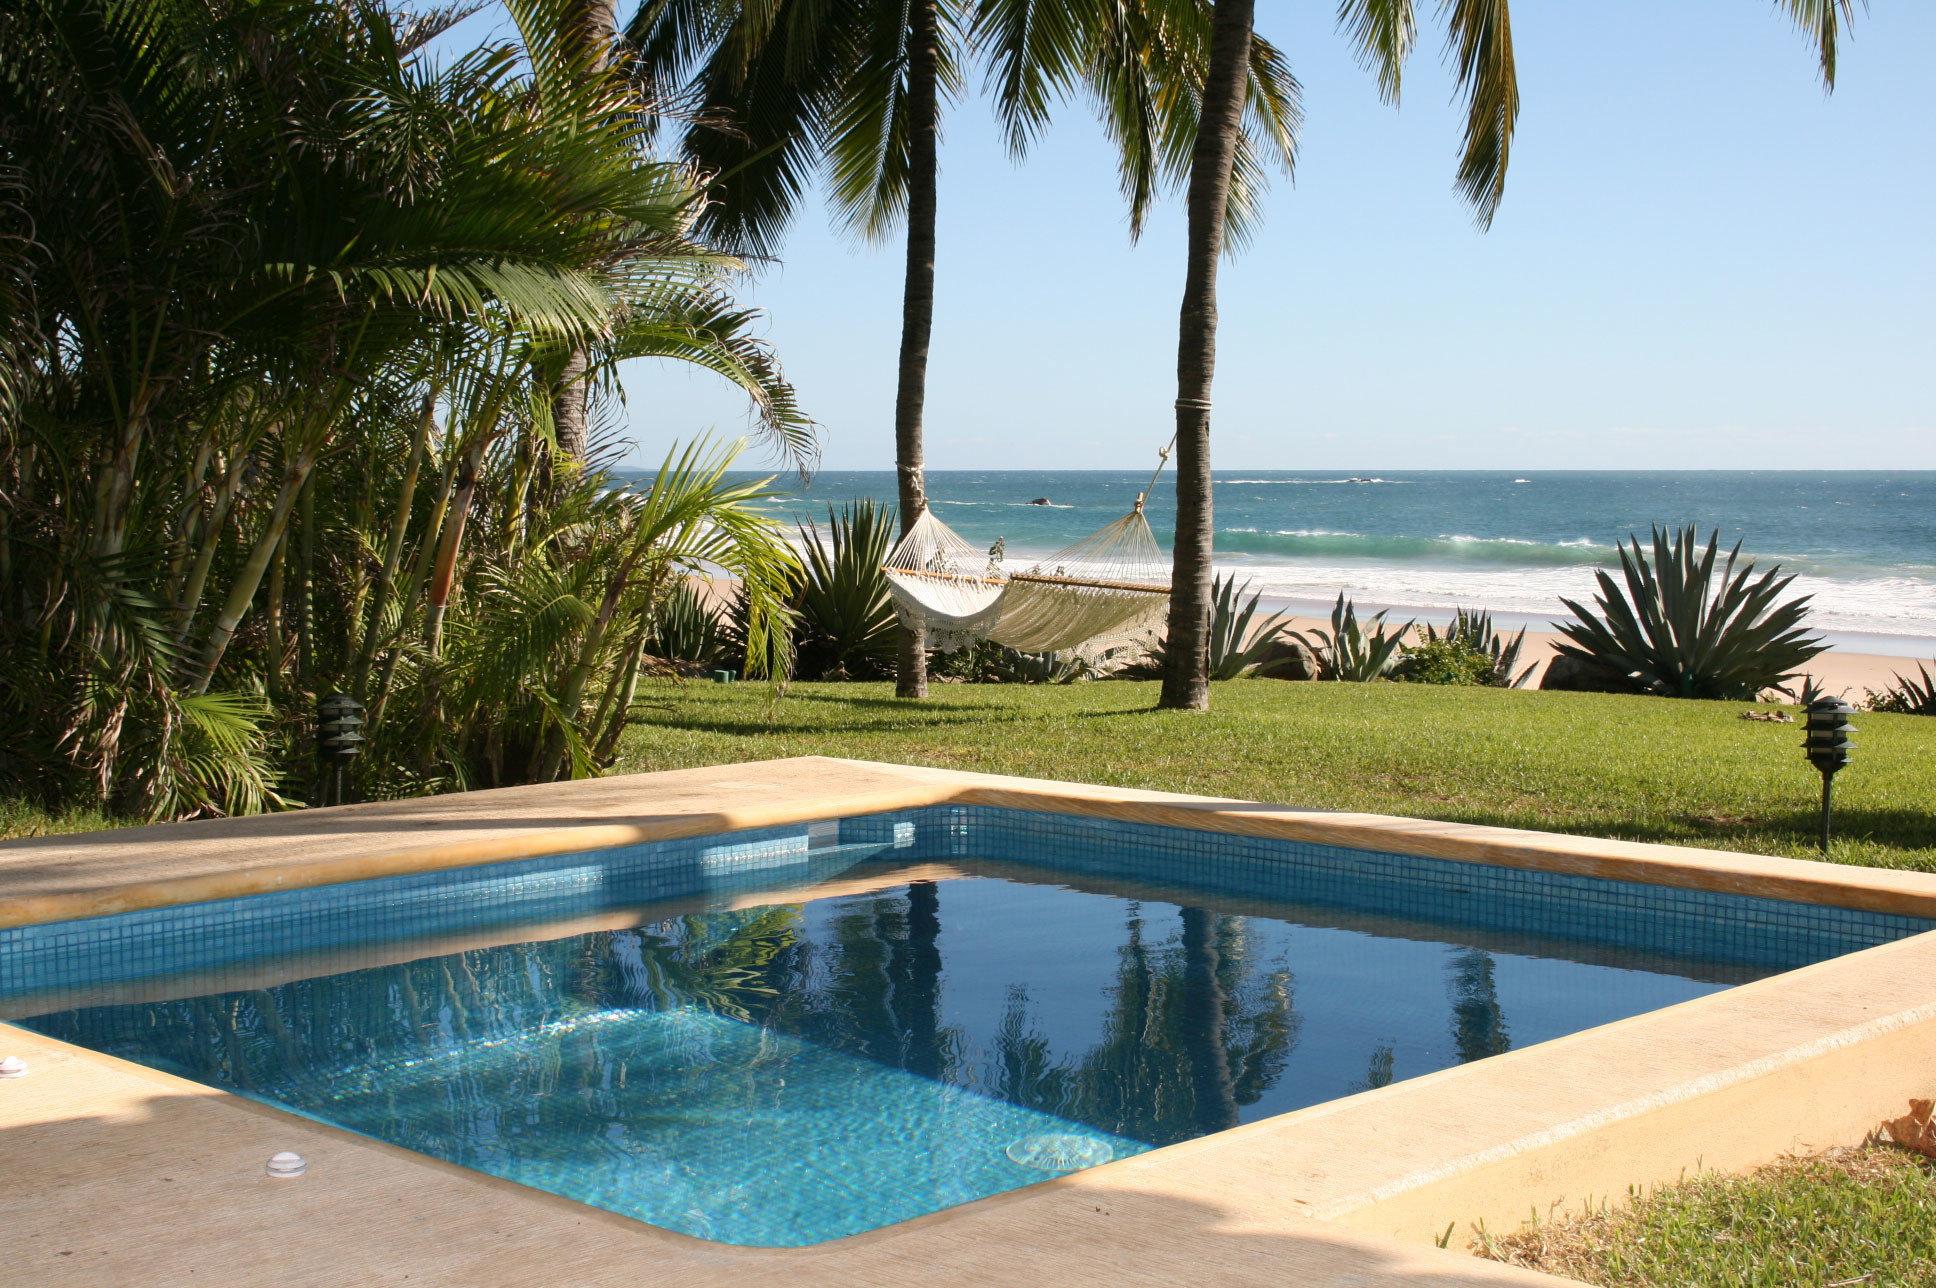 Beachfront Hotels Luxury Pool Romance Scenic views water tree sky palm swimming pool property Beach leisure swimming Resort Villa Ocean backyard home shore pond lined overlooking shade